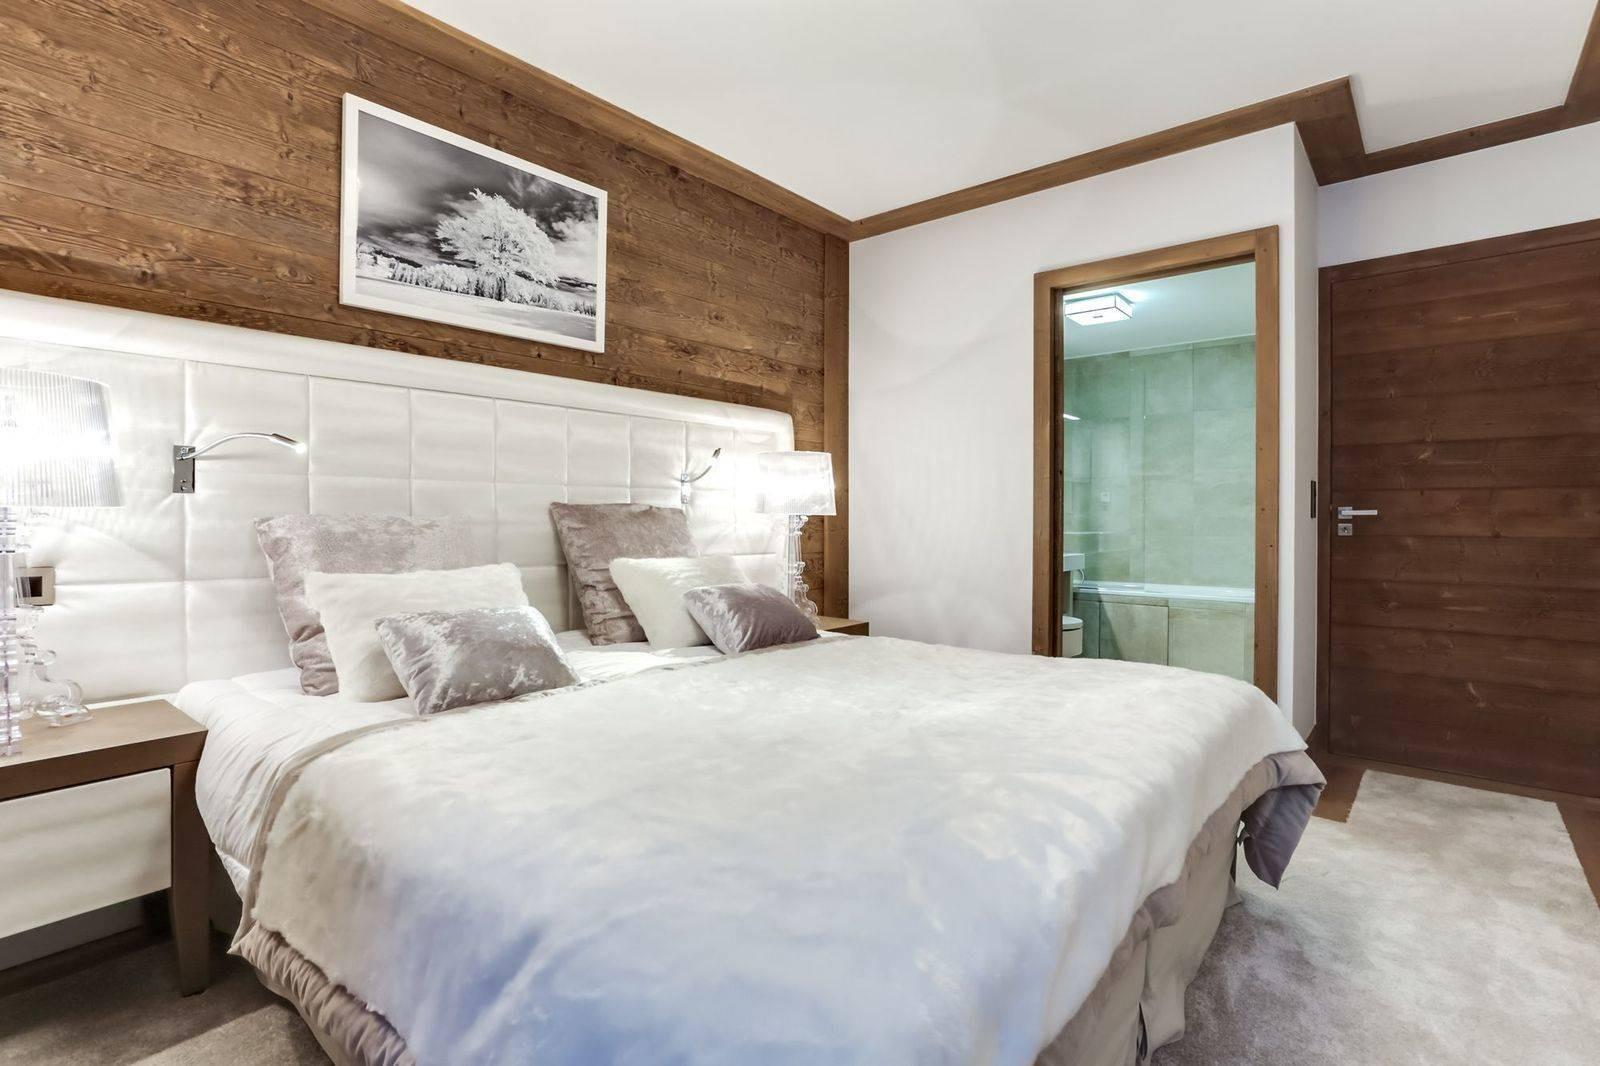 Courchevel 1550 Luxury Rental Appartment Telikia Bedroom 4